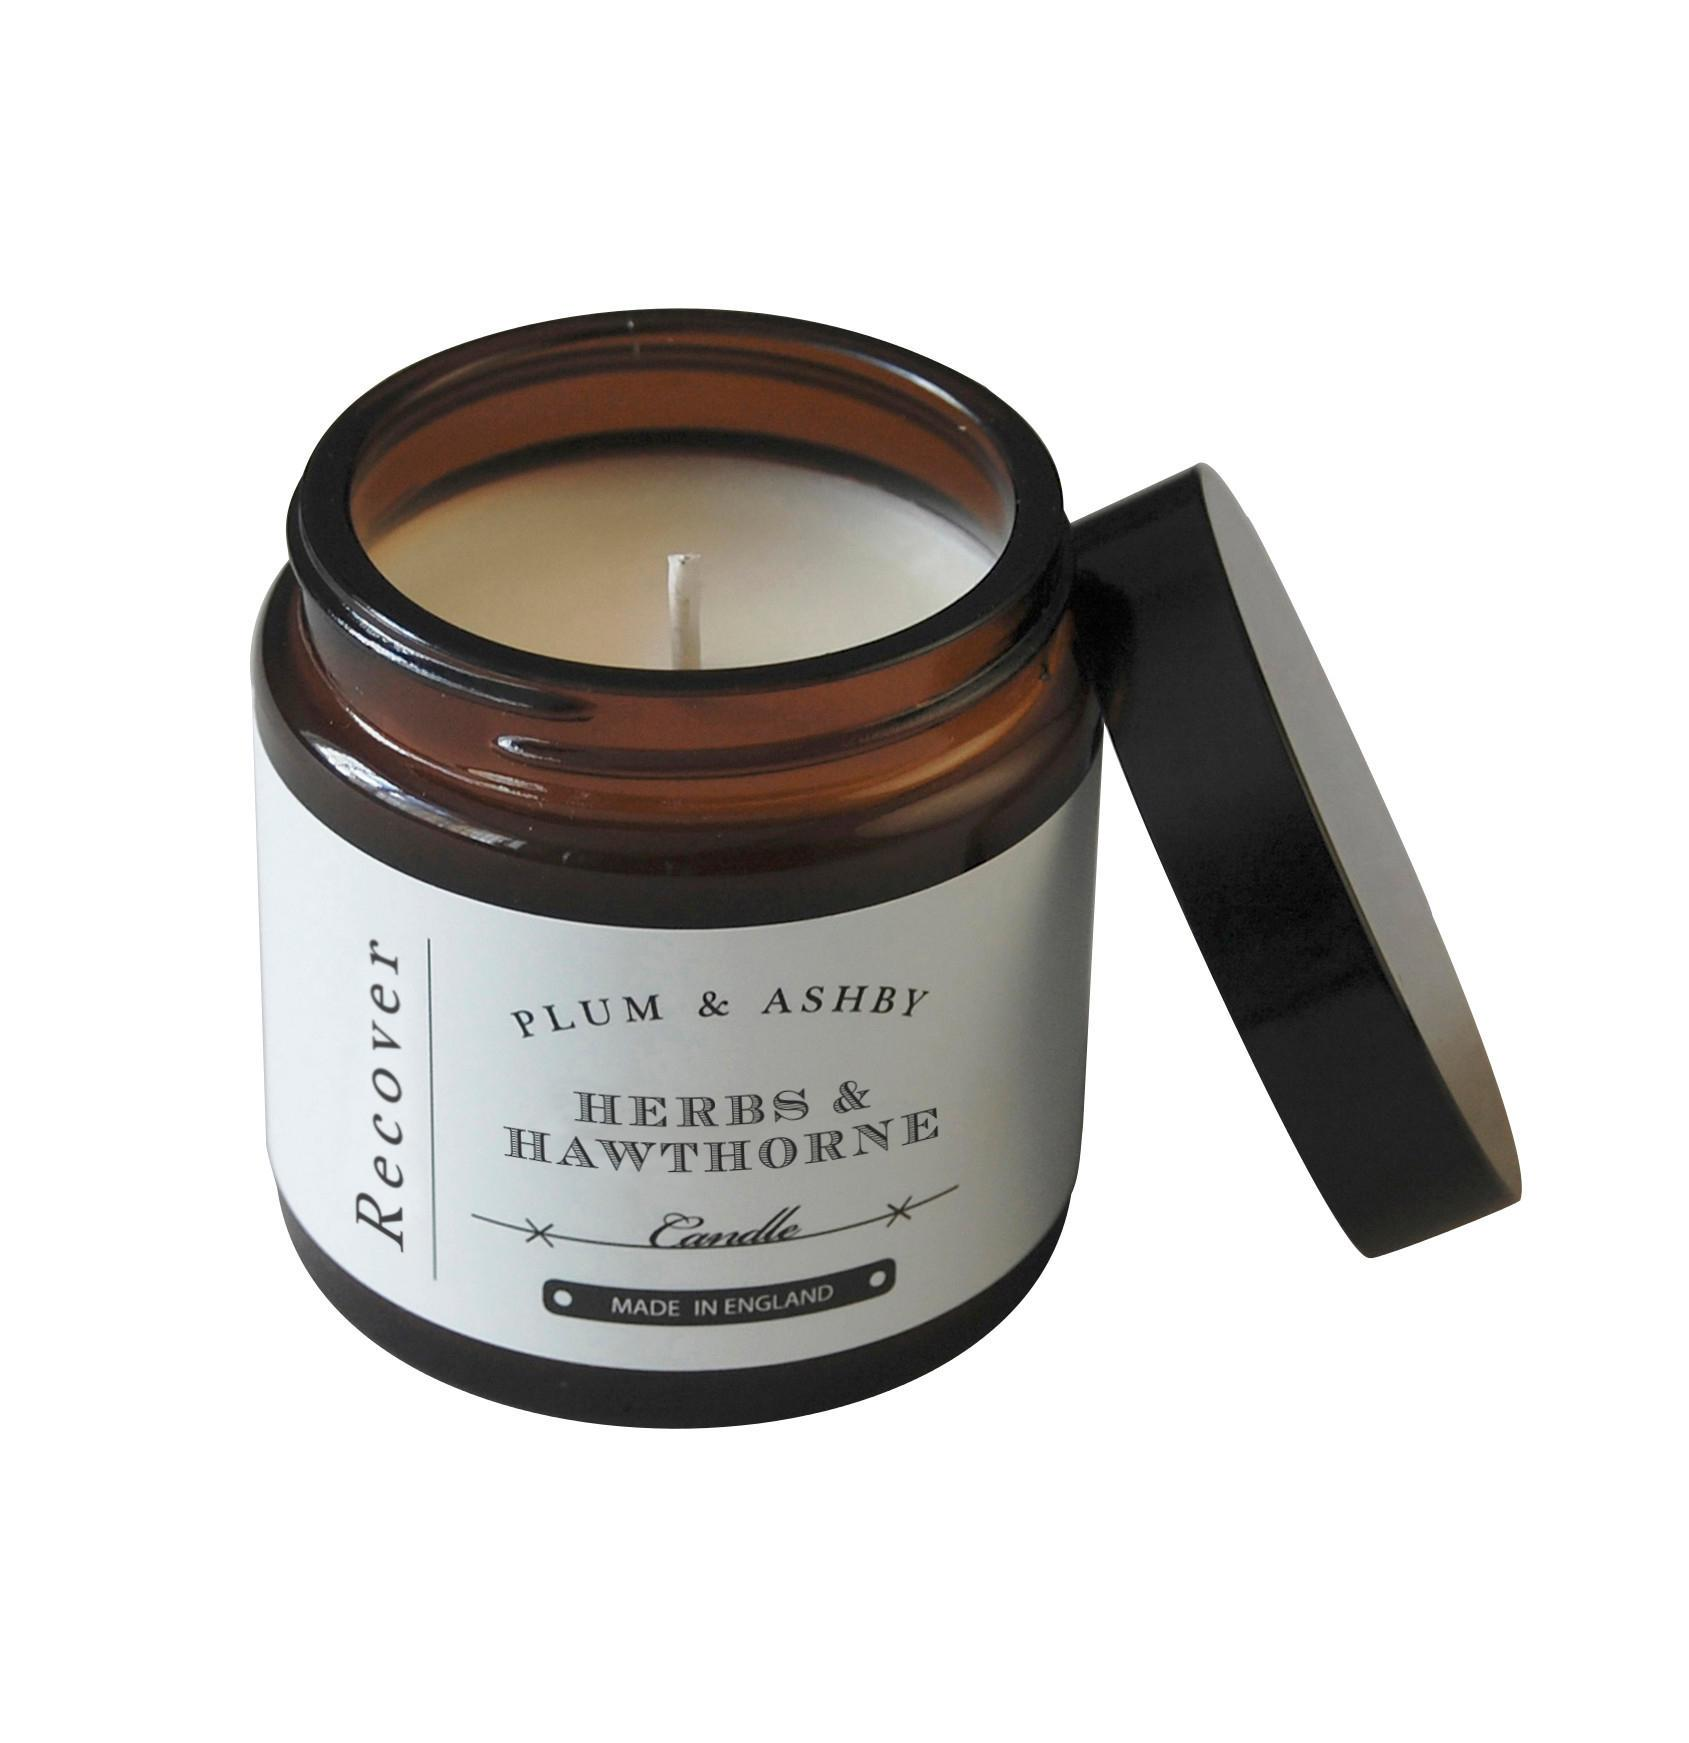 PLUM & ASHBY Cestovní svíčka Herbs & Hawthorne - Recover, hnědá barva, sklo